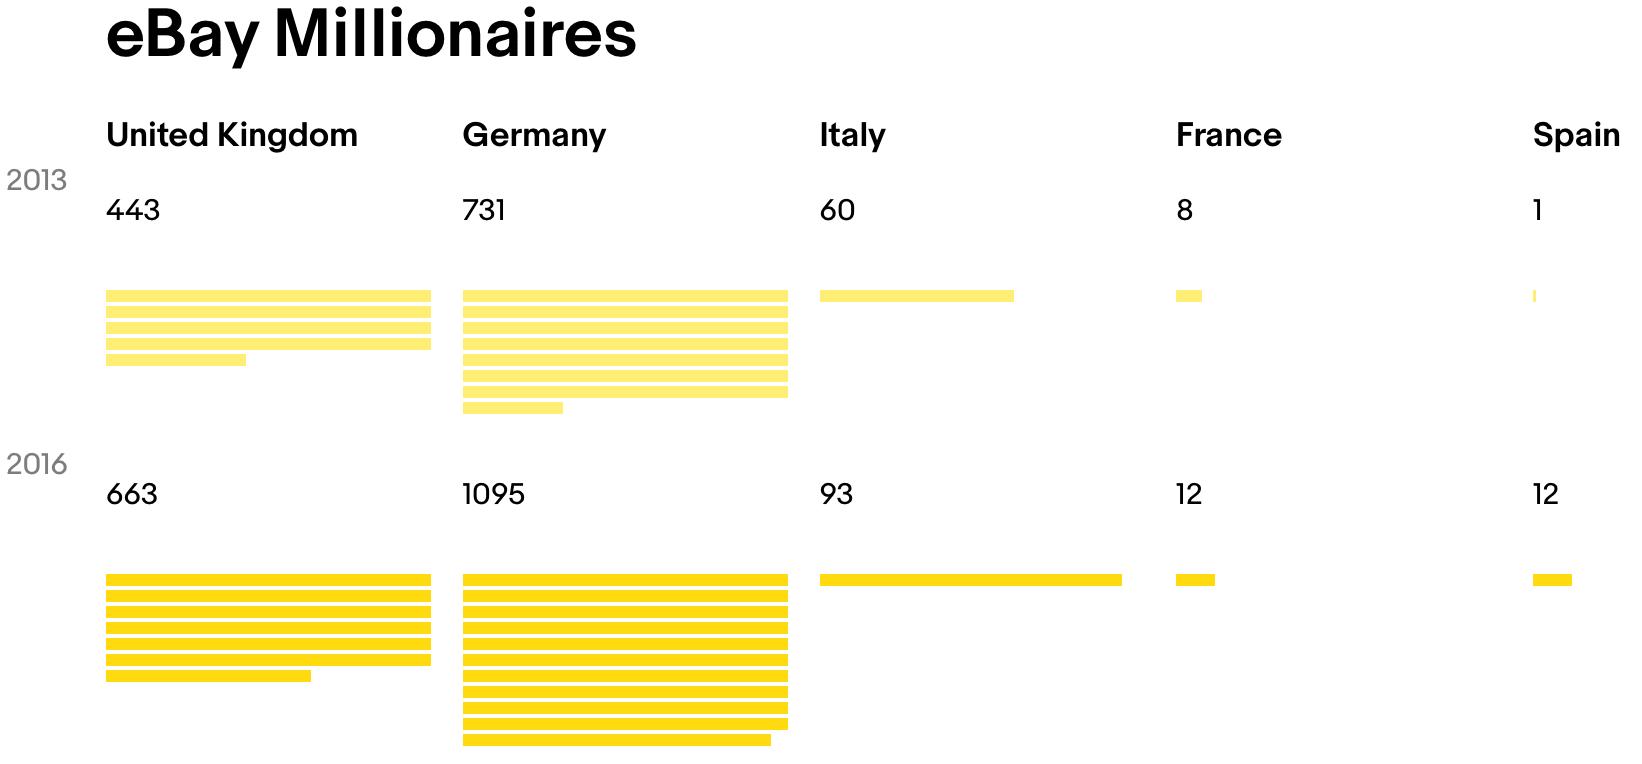 Ebay Has 1 875 Millionaire Sellers In Europe Marketplace Pulse